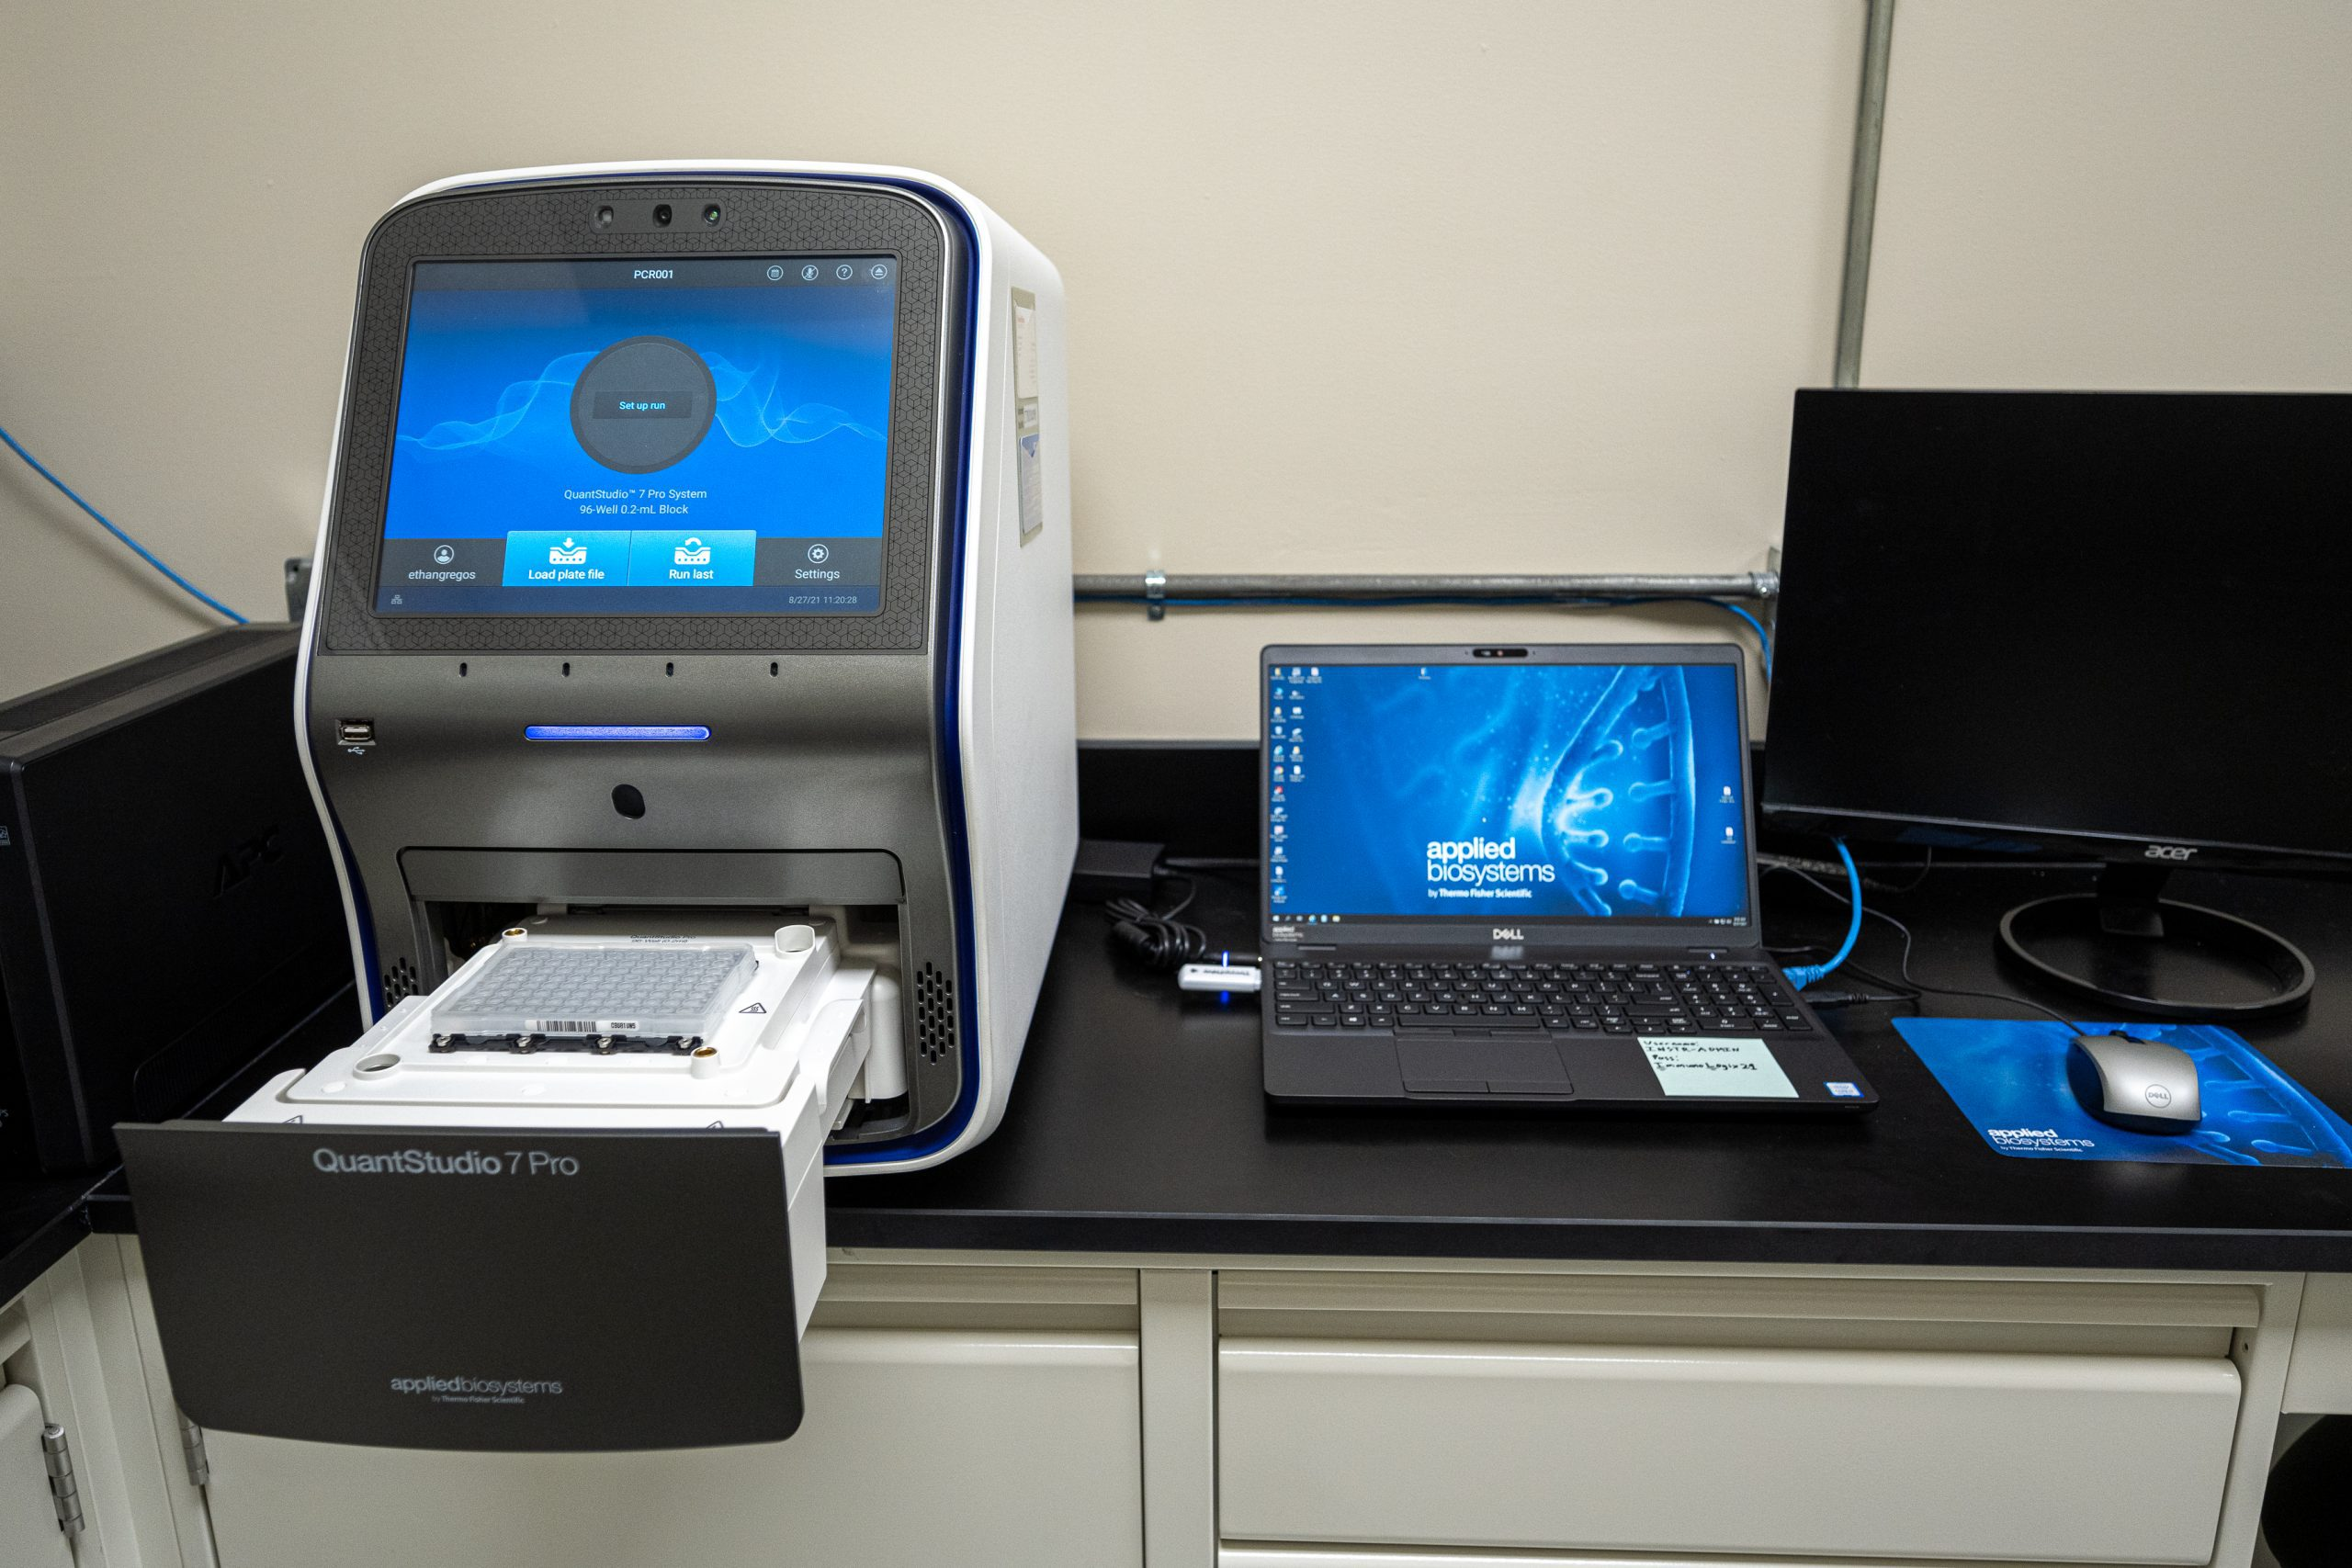 QuantStudio™ 7 Pro Real-Time PCR